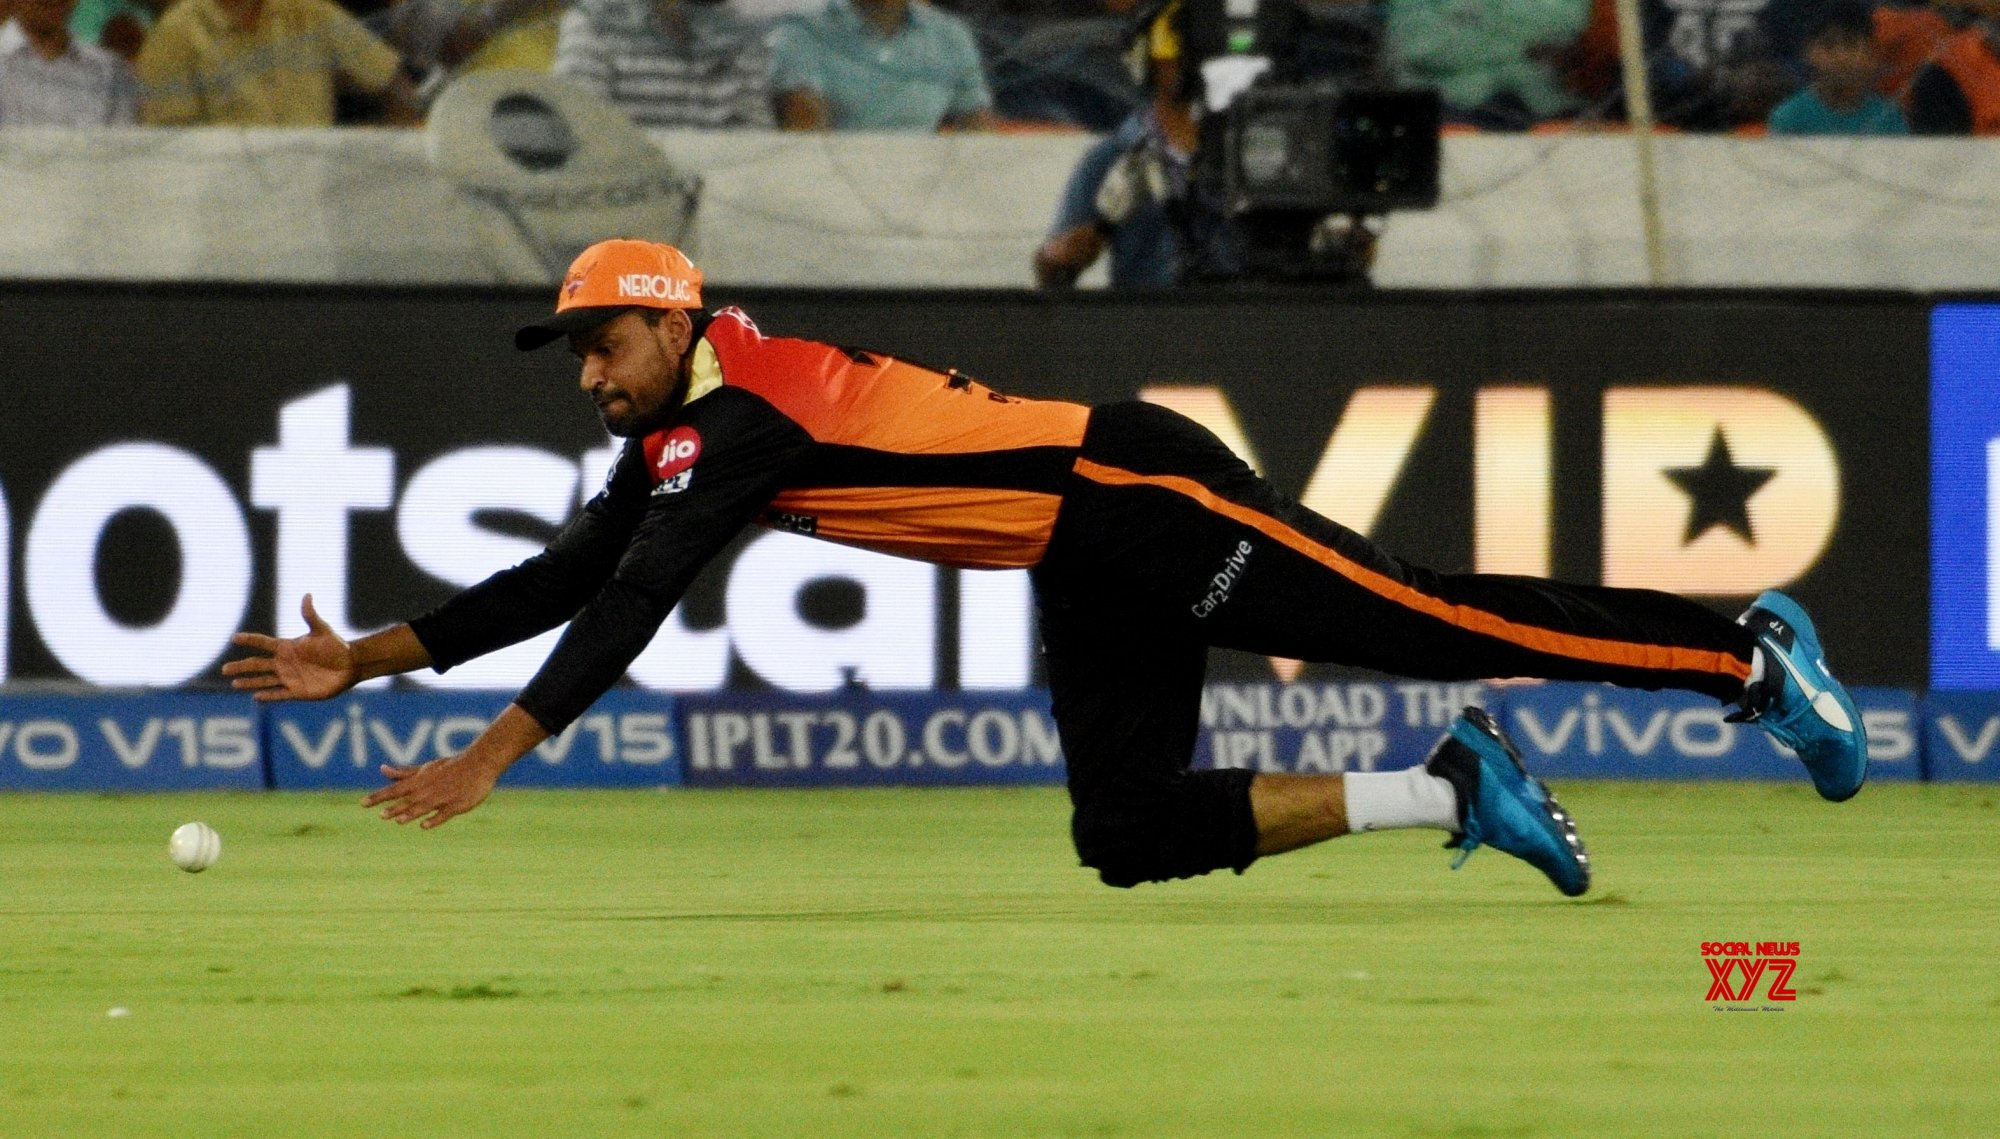 Hyderabad: IPL 2019 - Match 33 - Sunrisers Hyderabad Vs Chennai Super Kings (Batch - 4) #Gallery